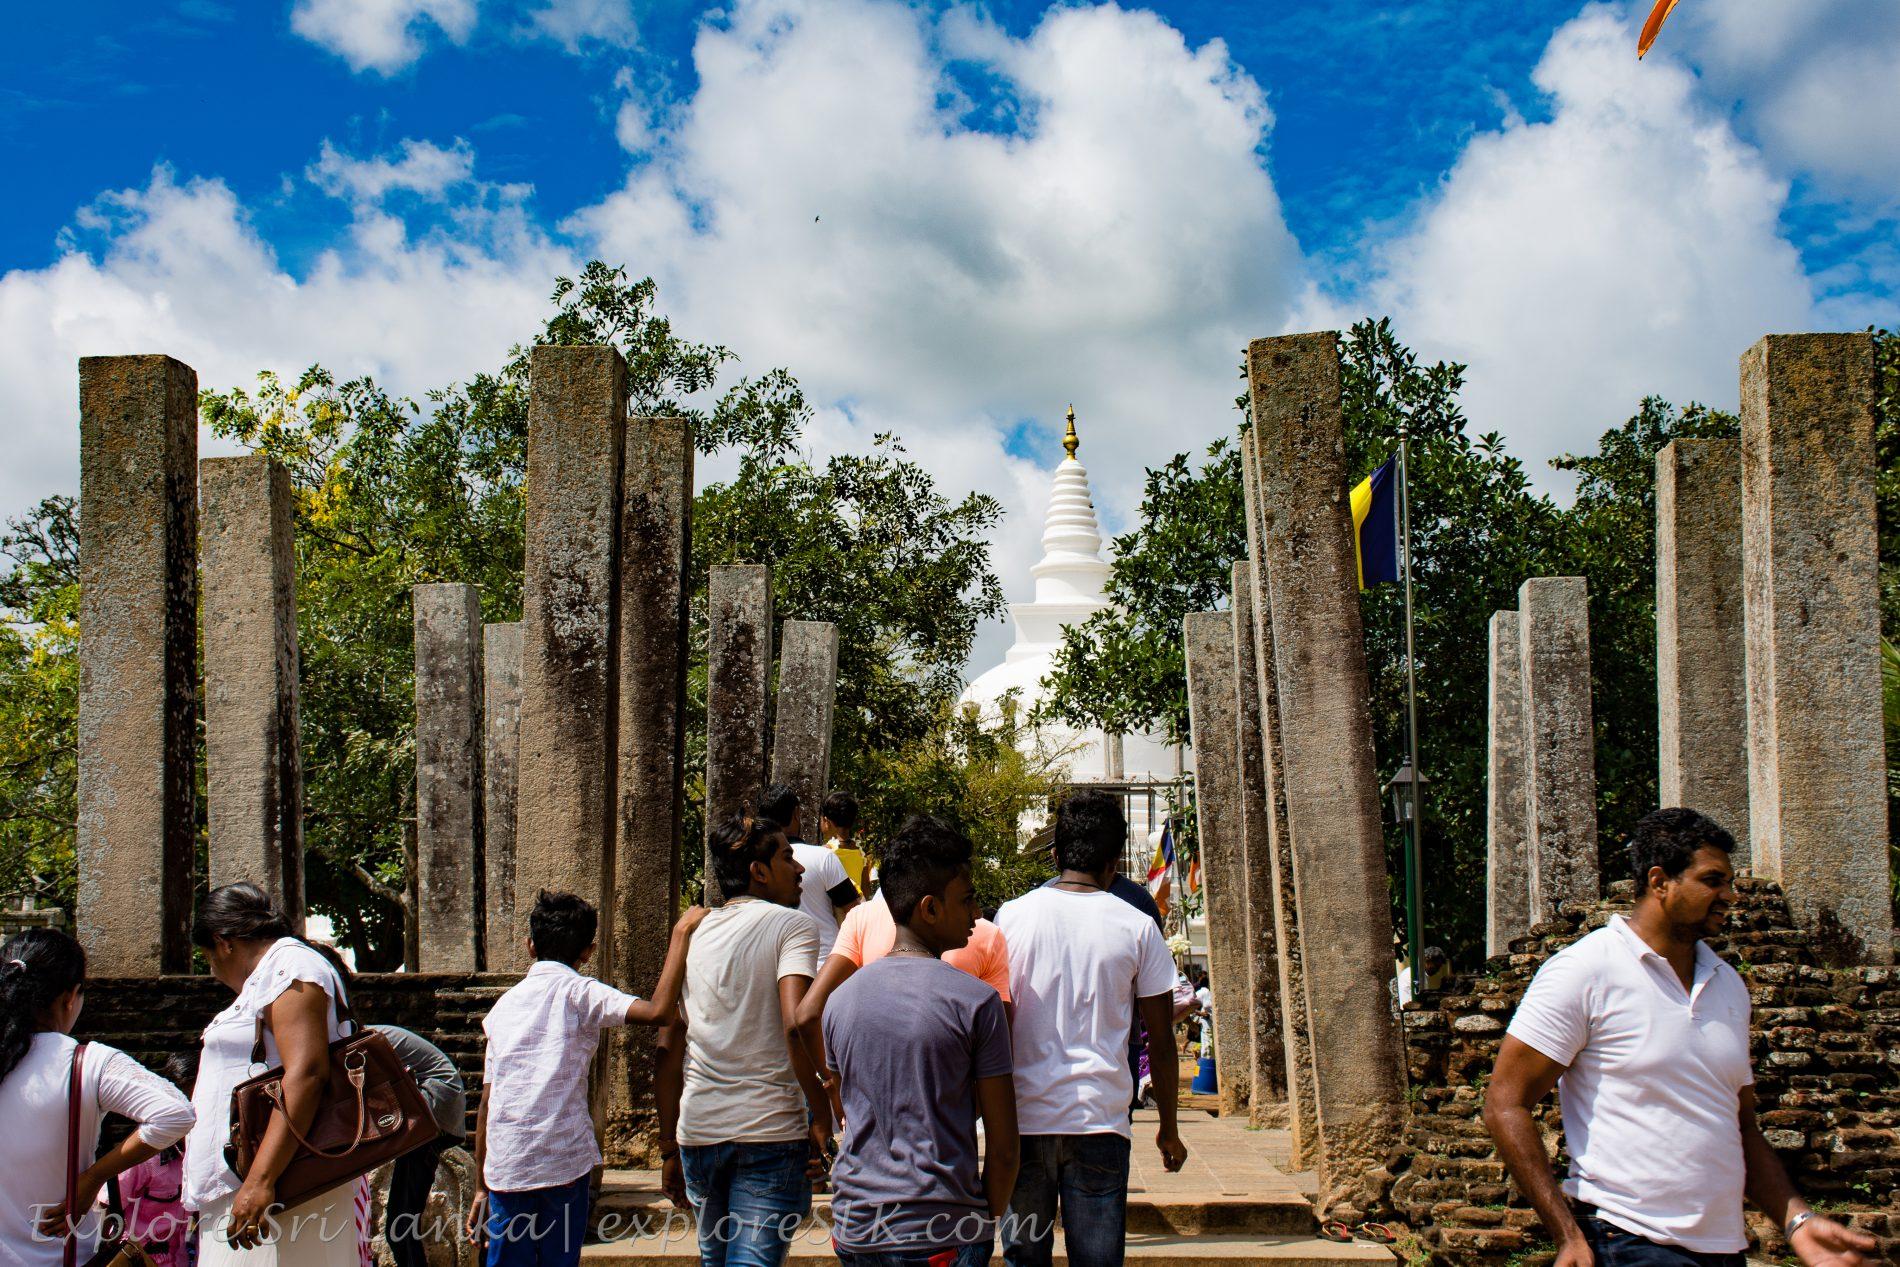 Entrance of Thuparamaya Stupa